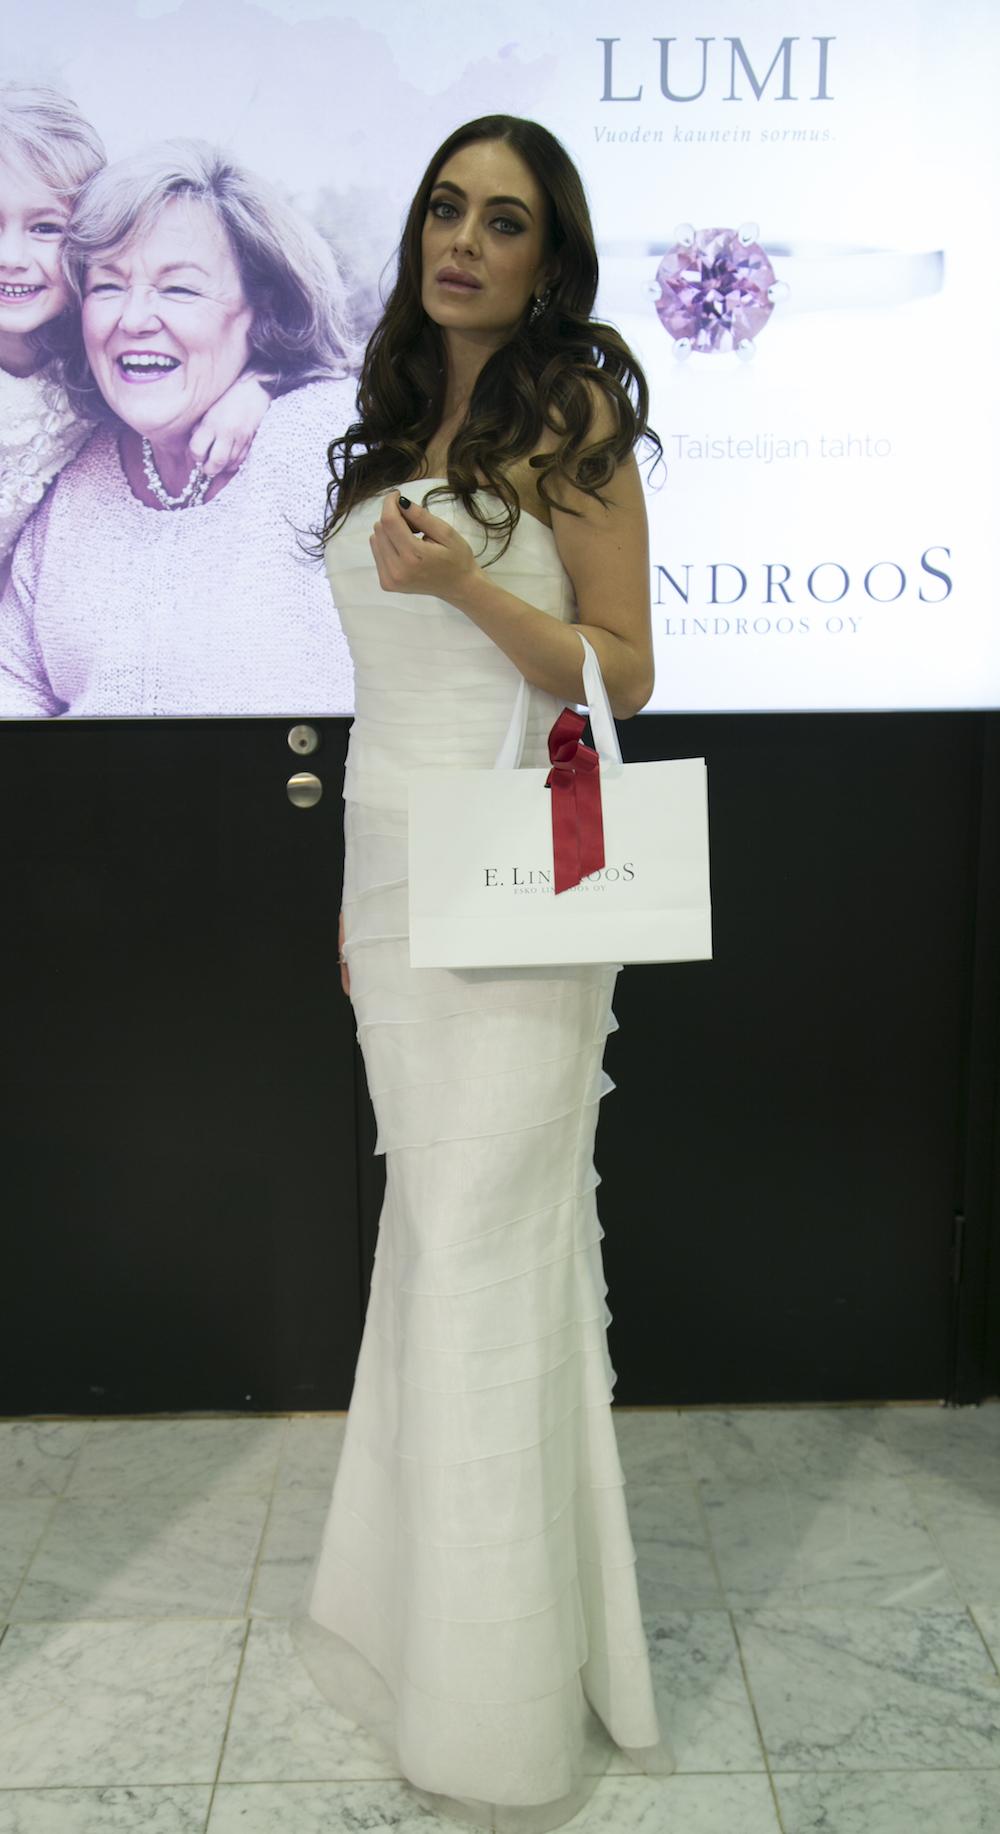 kilpailija numero 9. Jessica Ruokola